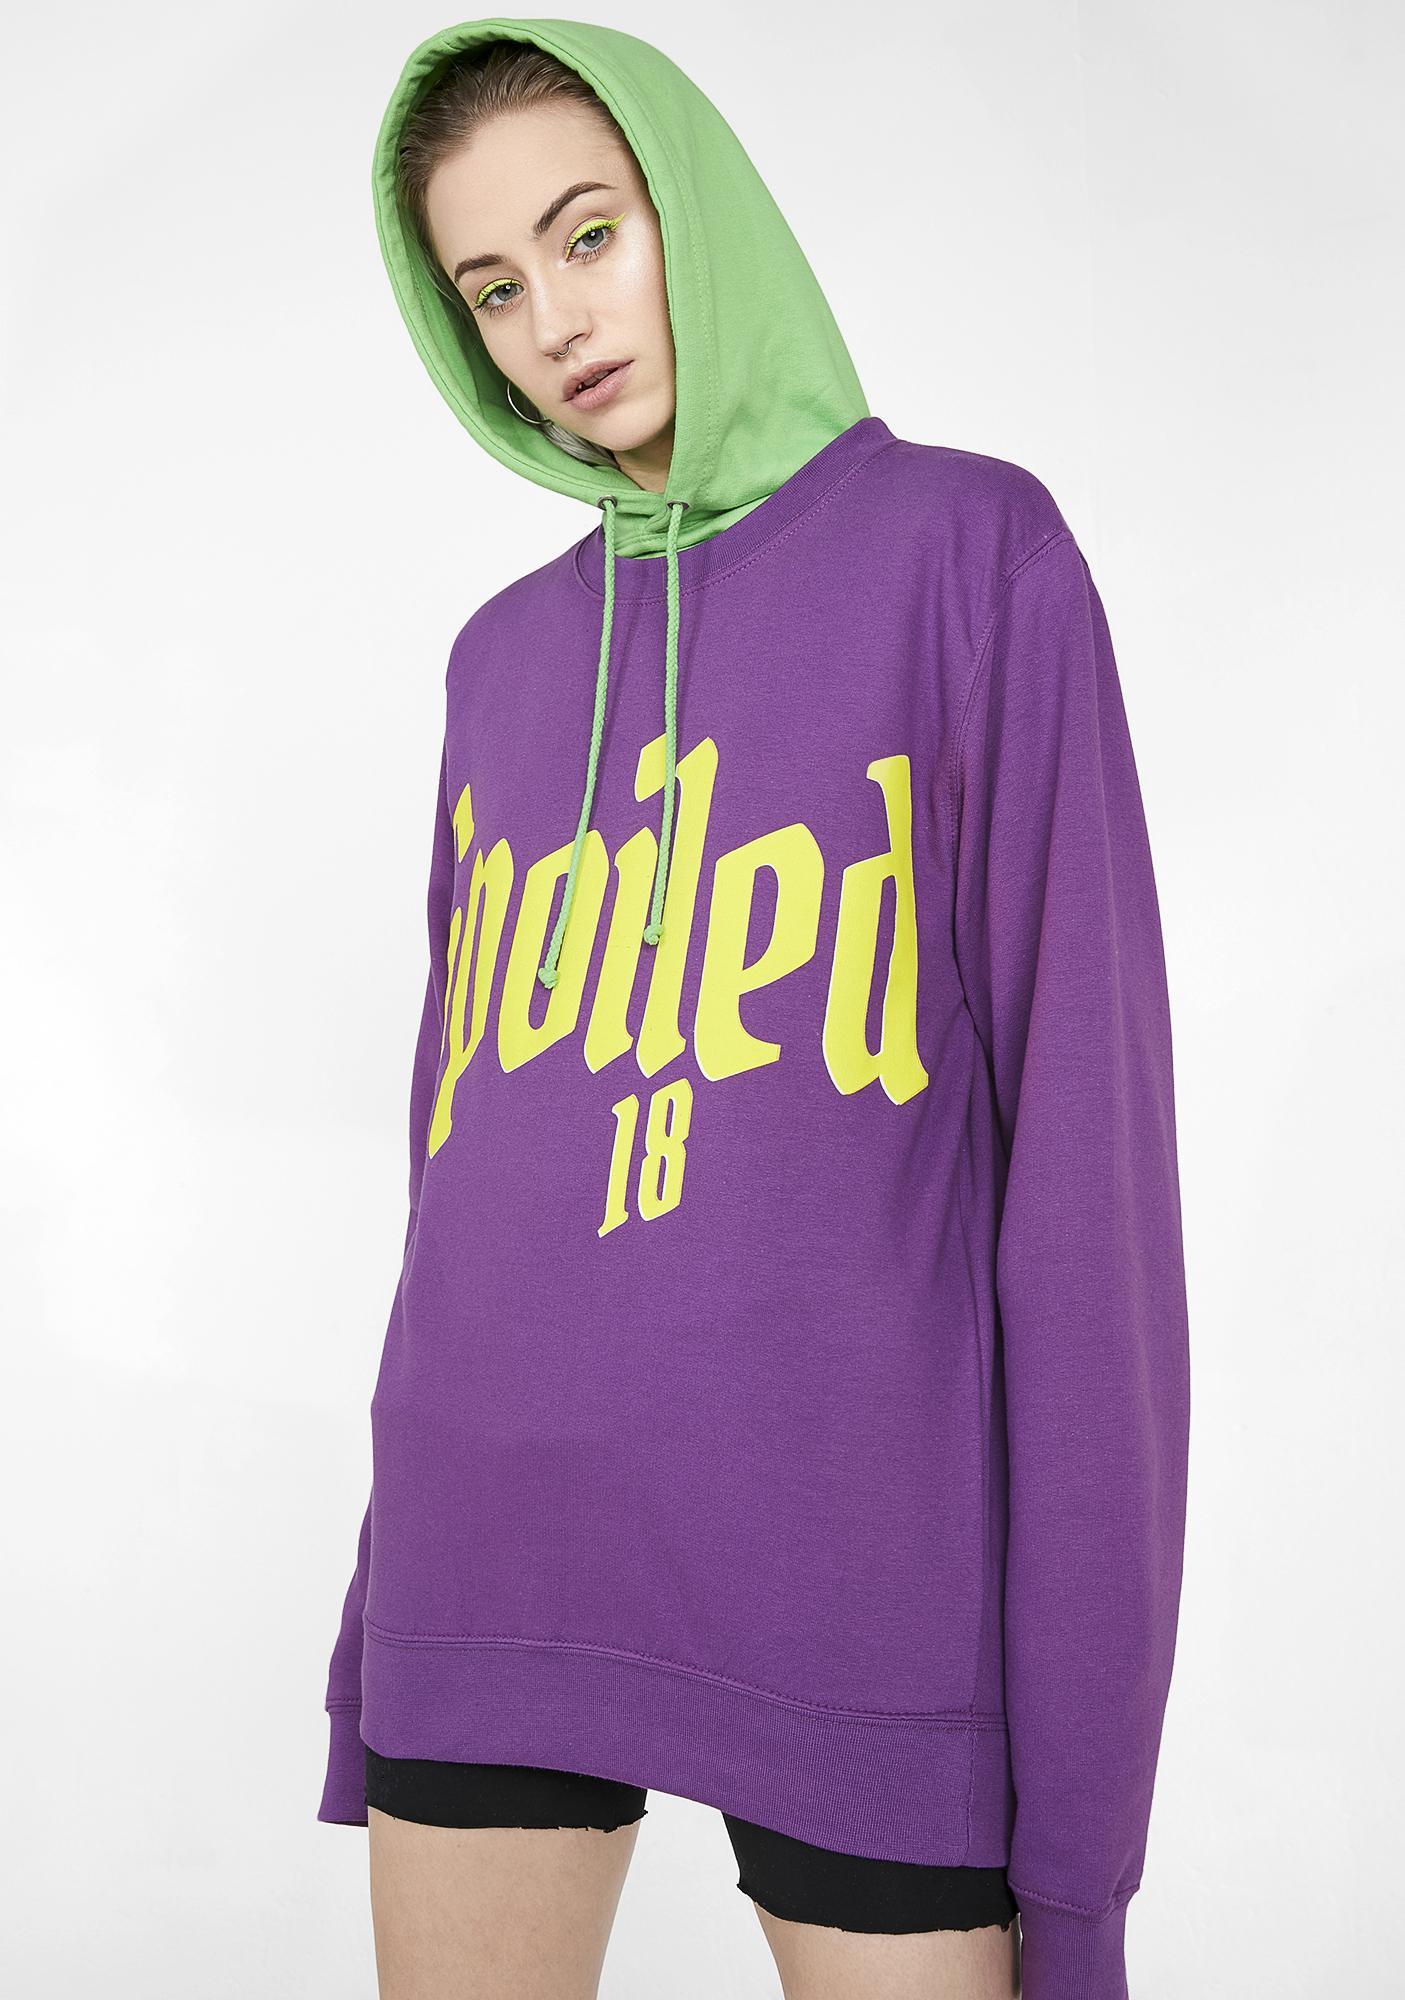 Illustrated People Spoiled Graphic Sweatshirt